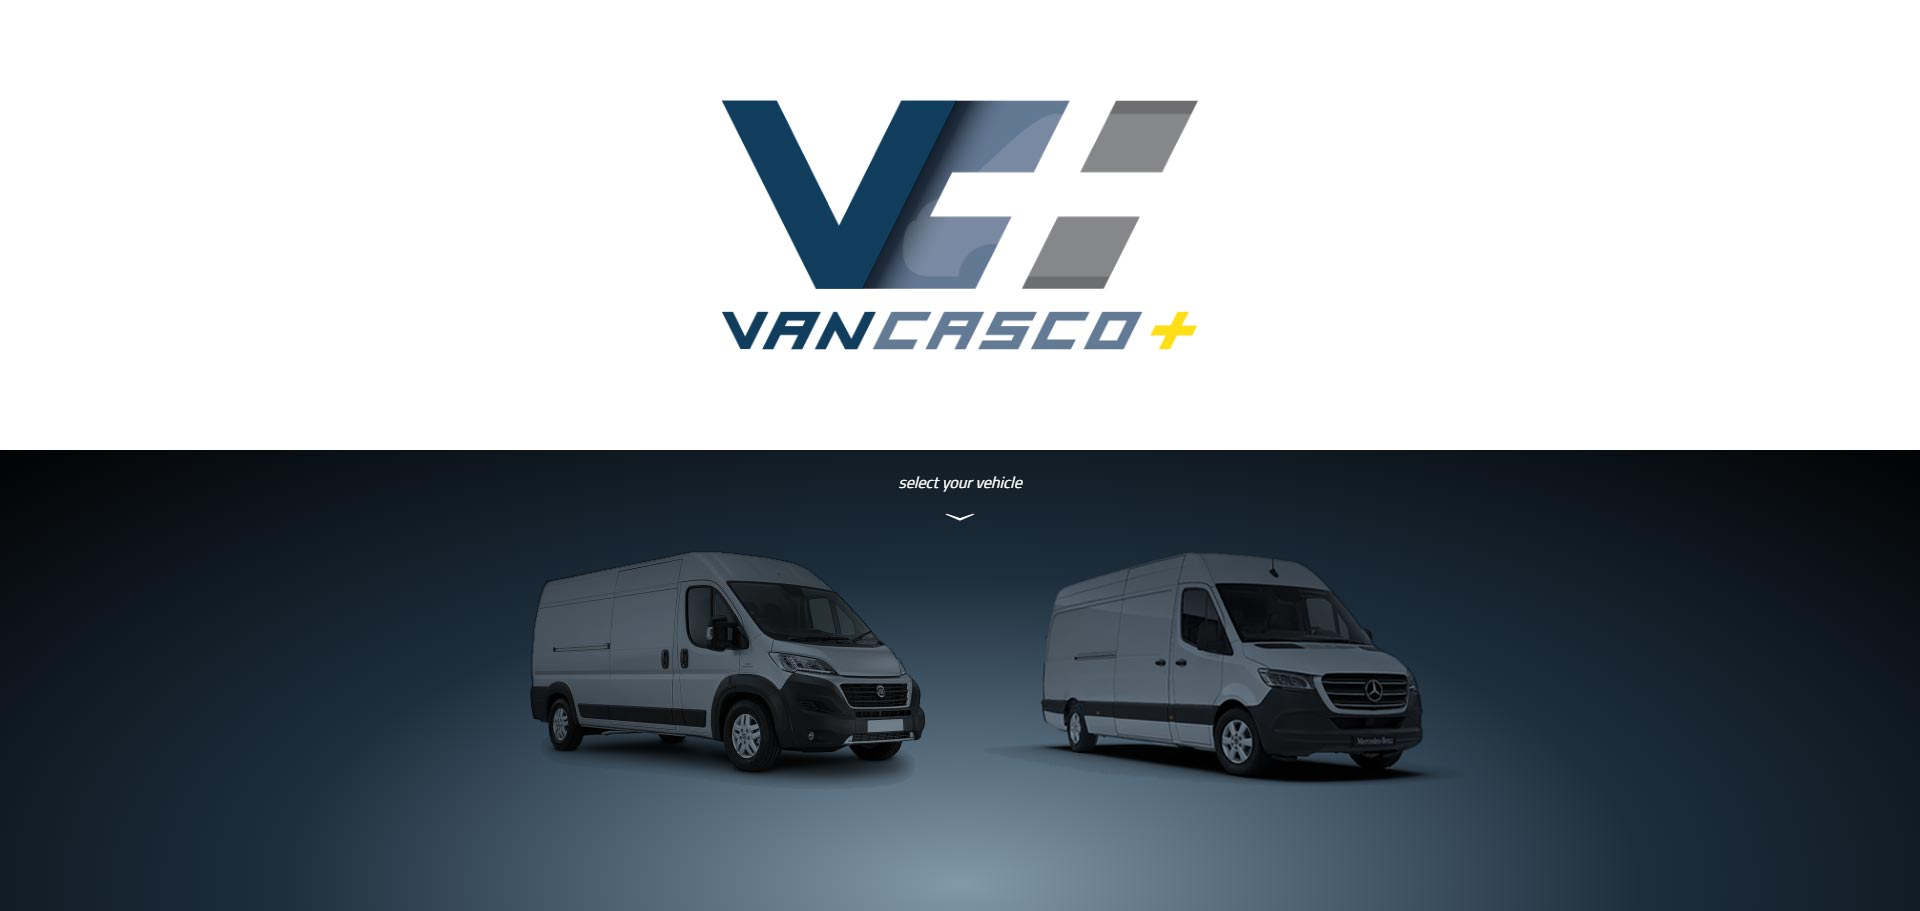 VanCasco+-Configurator—1